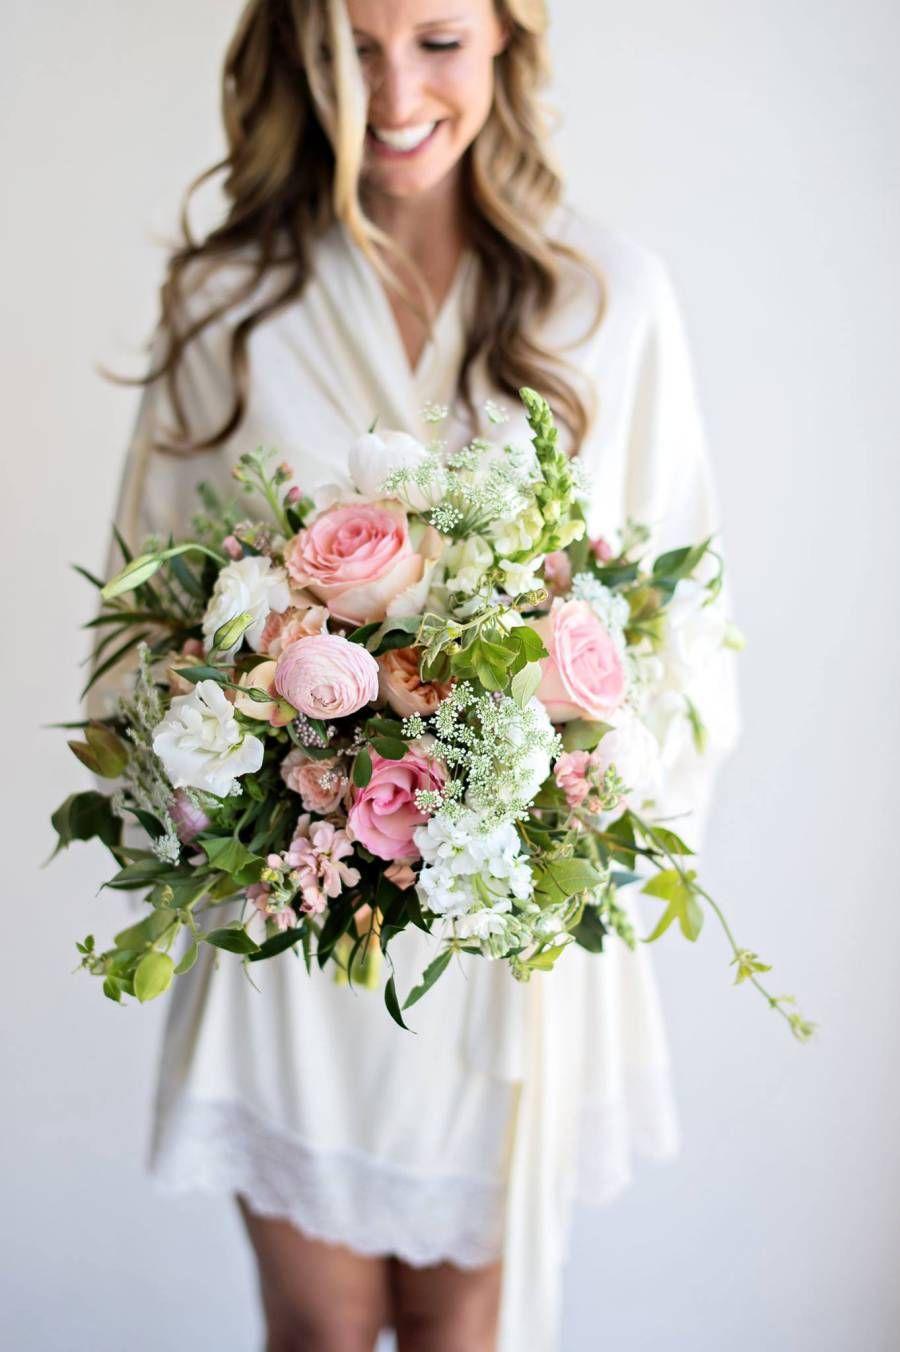 20 amazing wedding bouquets bouquets pinterest flower bouquets 20 amazing wedding bouquets aisle perfect wedding flowers bouquet izmirmasajfo